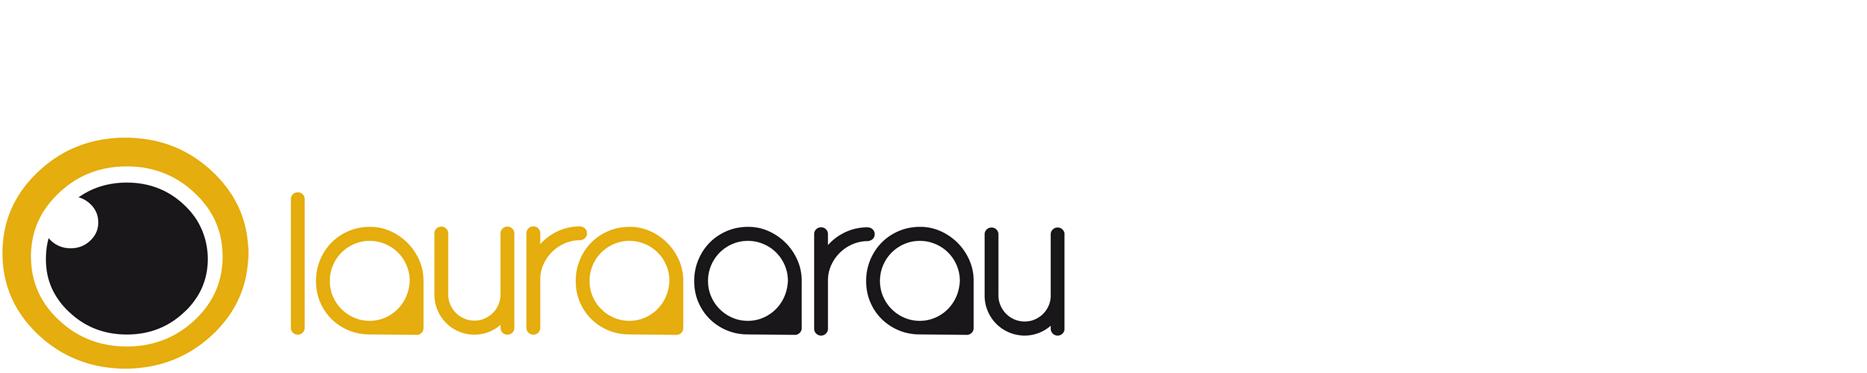 cropped-logo2017_21.png